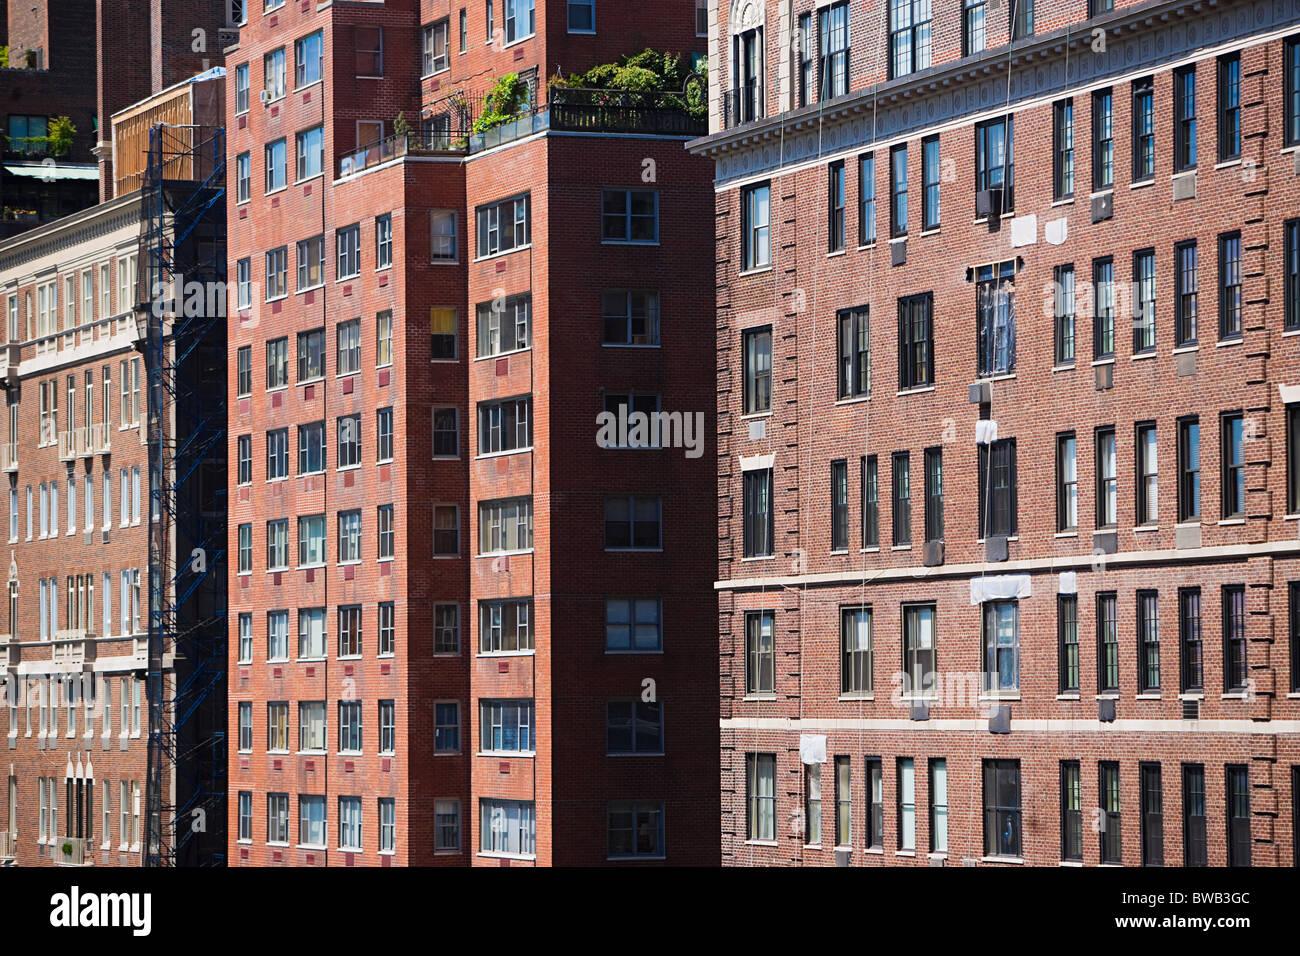 Buildings in New York - Stock Image